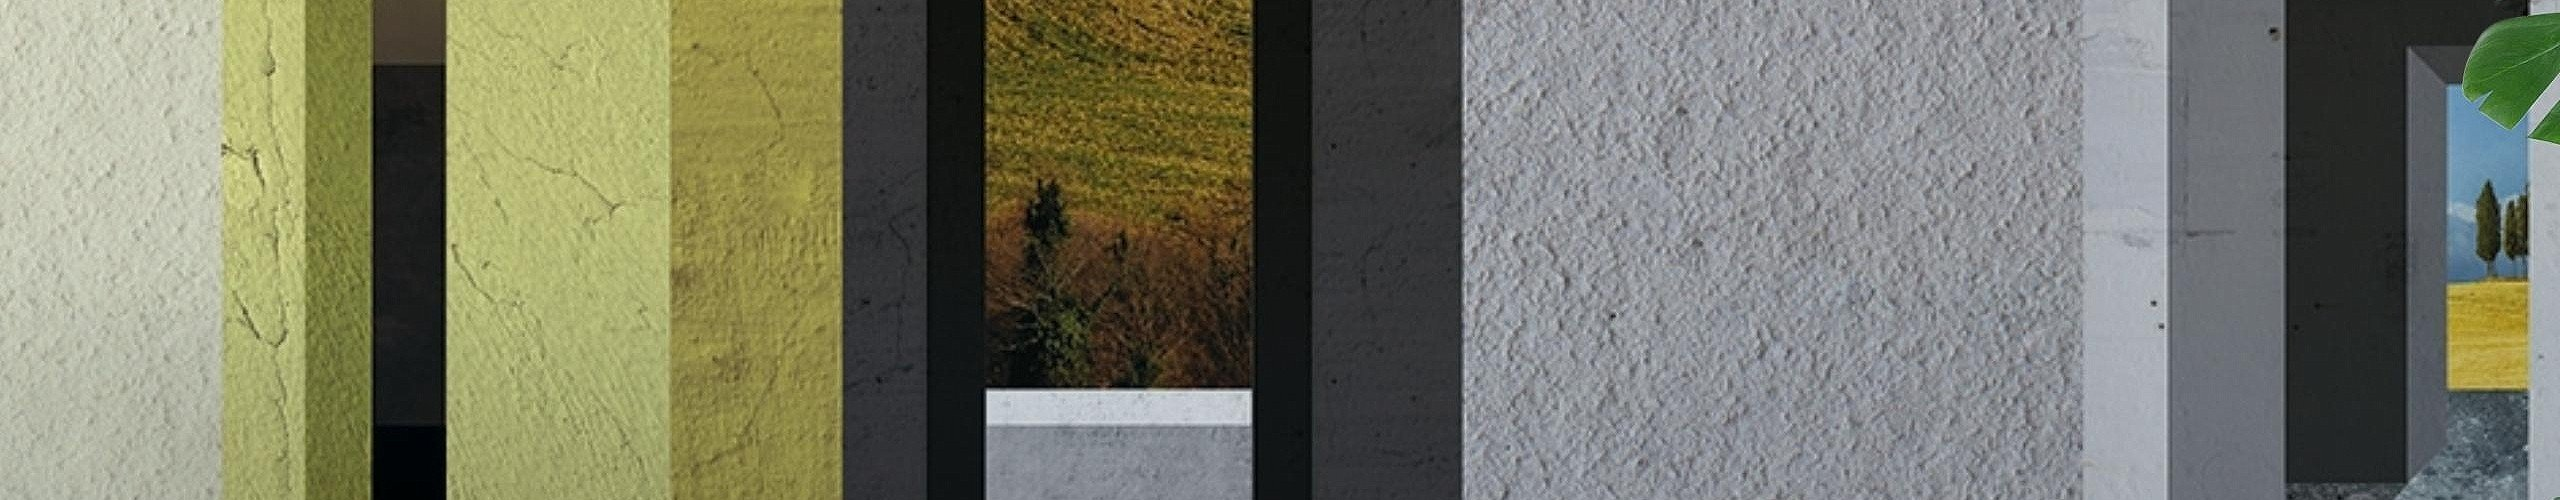 24 Wandfarbe Latex Oder Dispersion